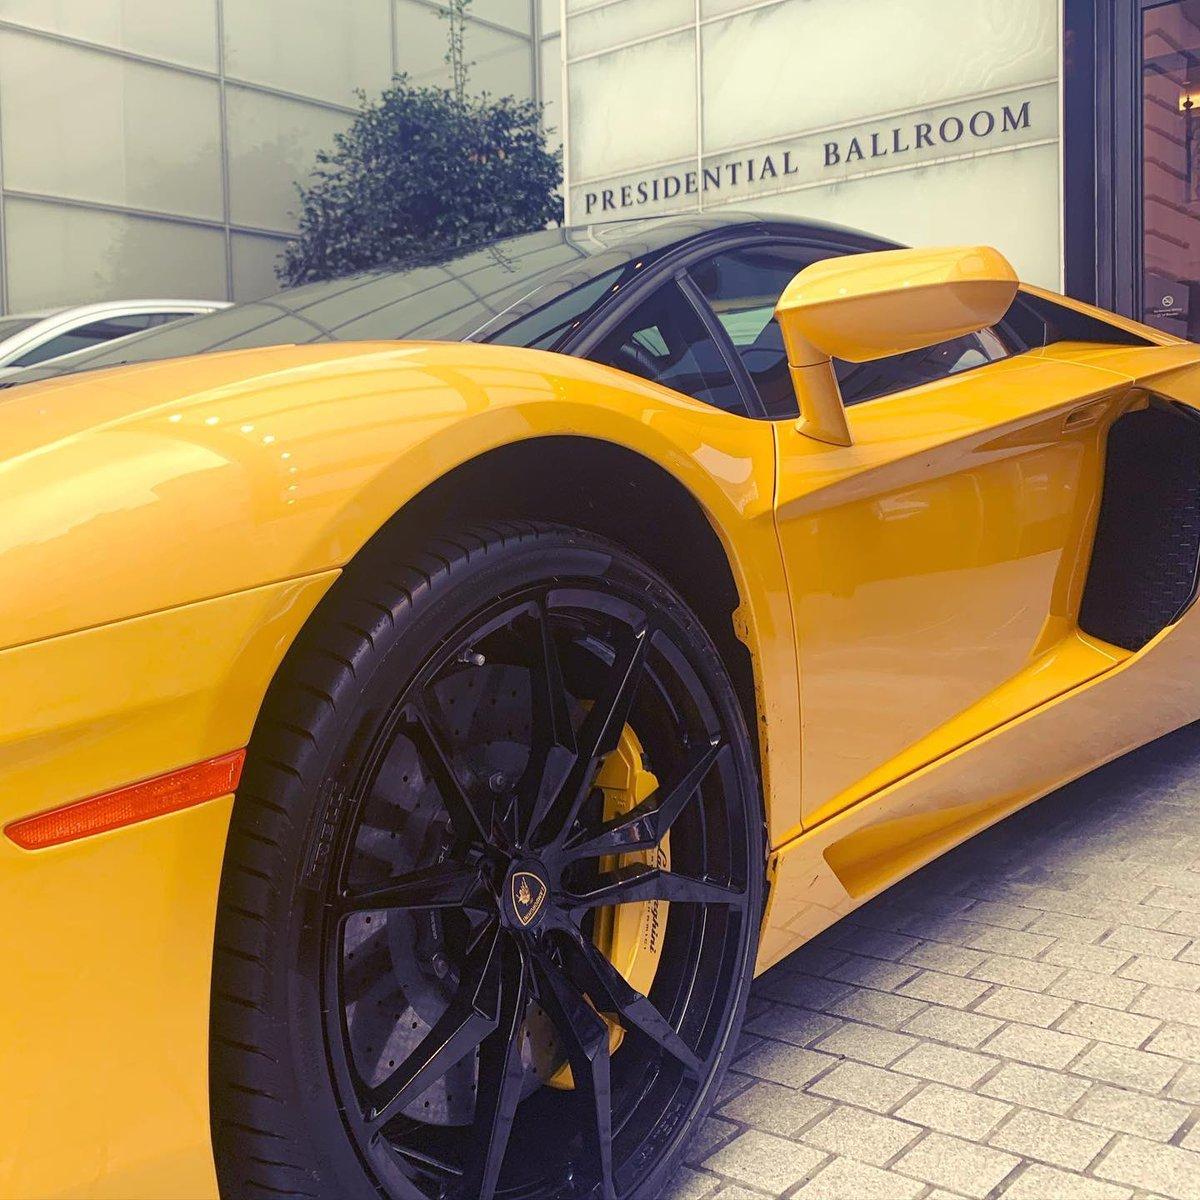 A sporty kind of day...#Lamborghini #Italy #Trump #Saturday #weekend #car #sportcars #WashingtonDC #success #NeverSettle